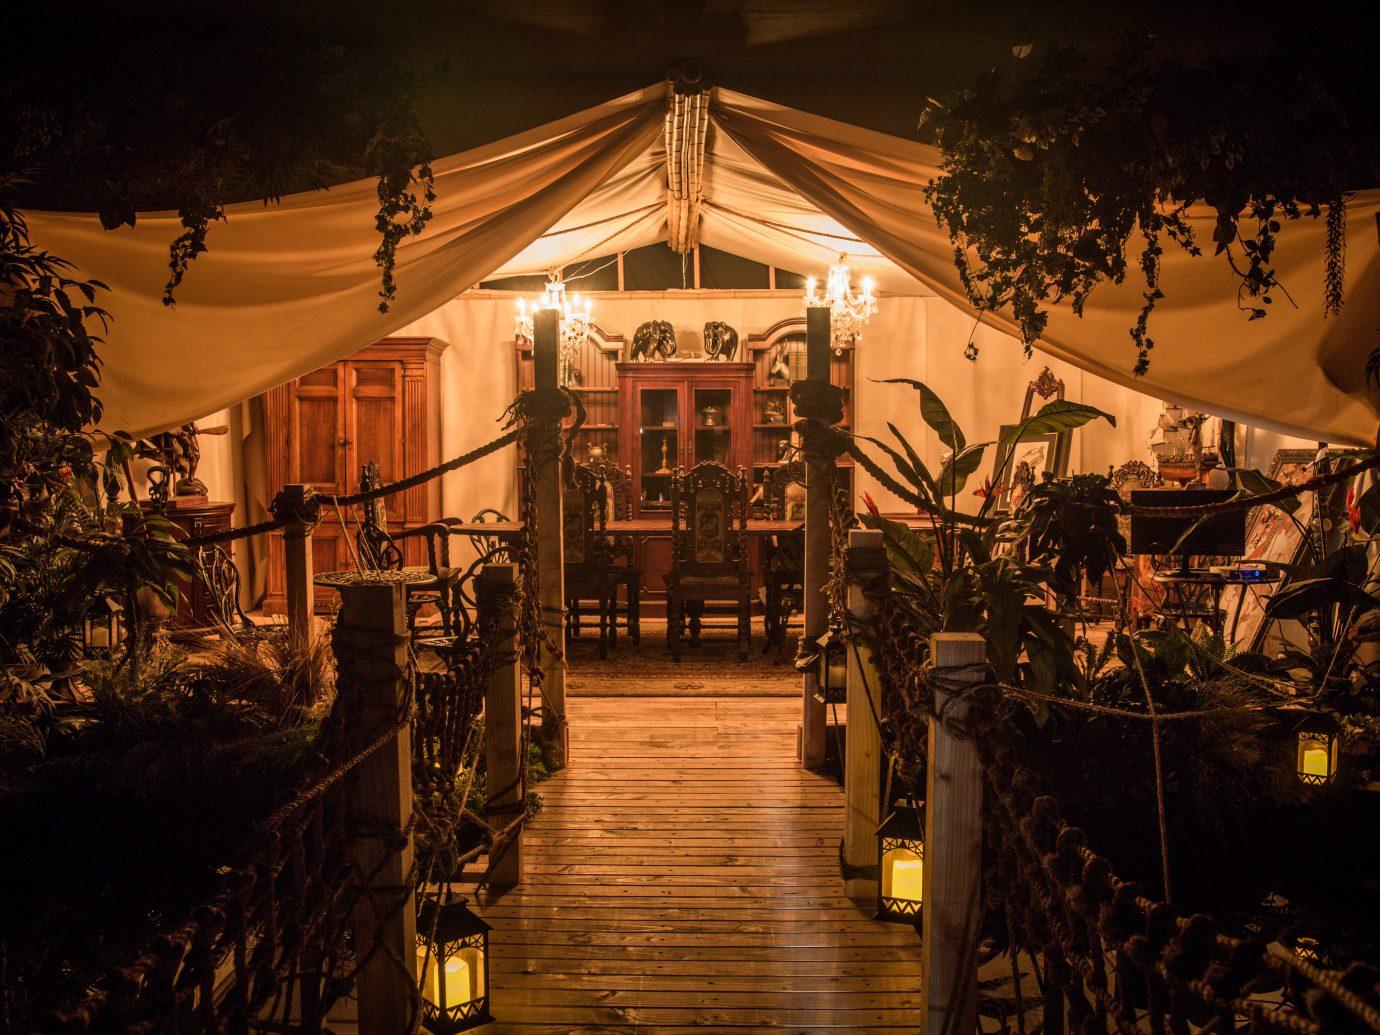 tent area exterior at Lost Spirits Distillery at night